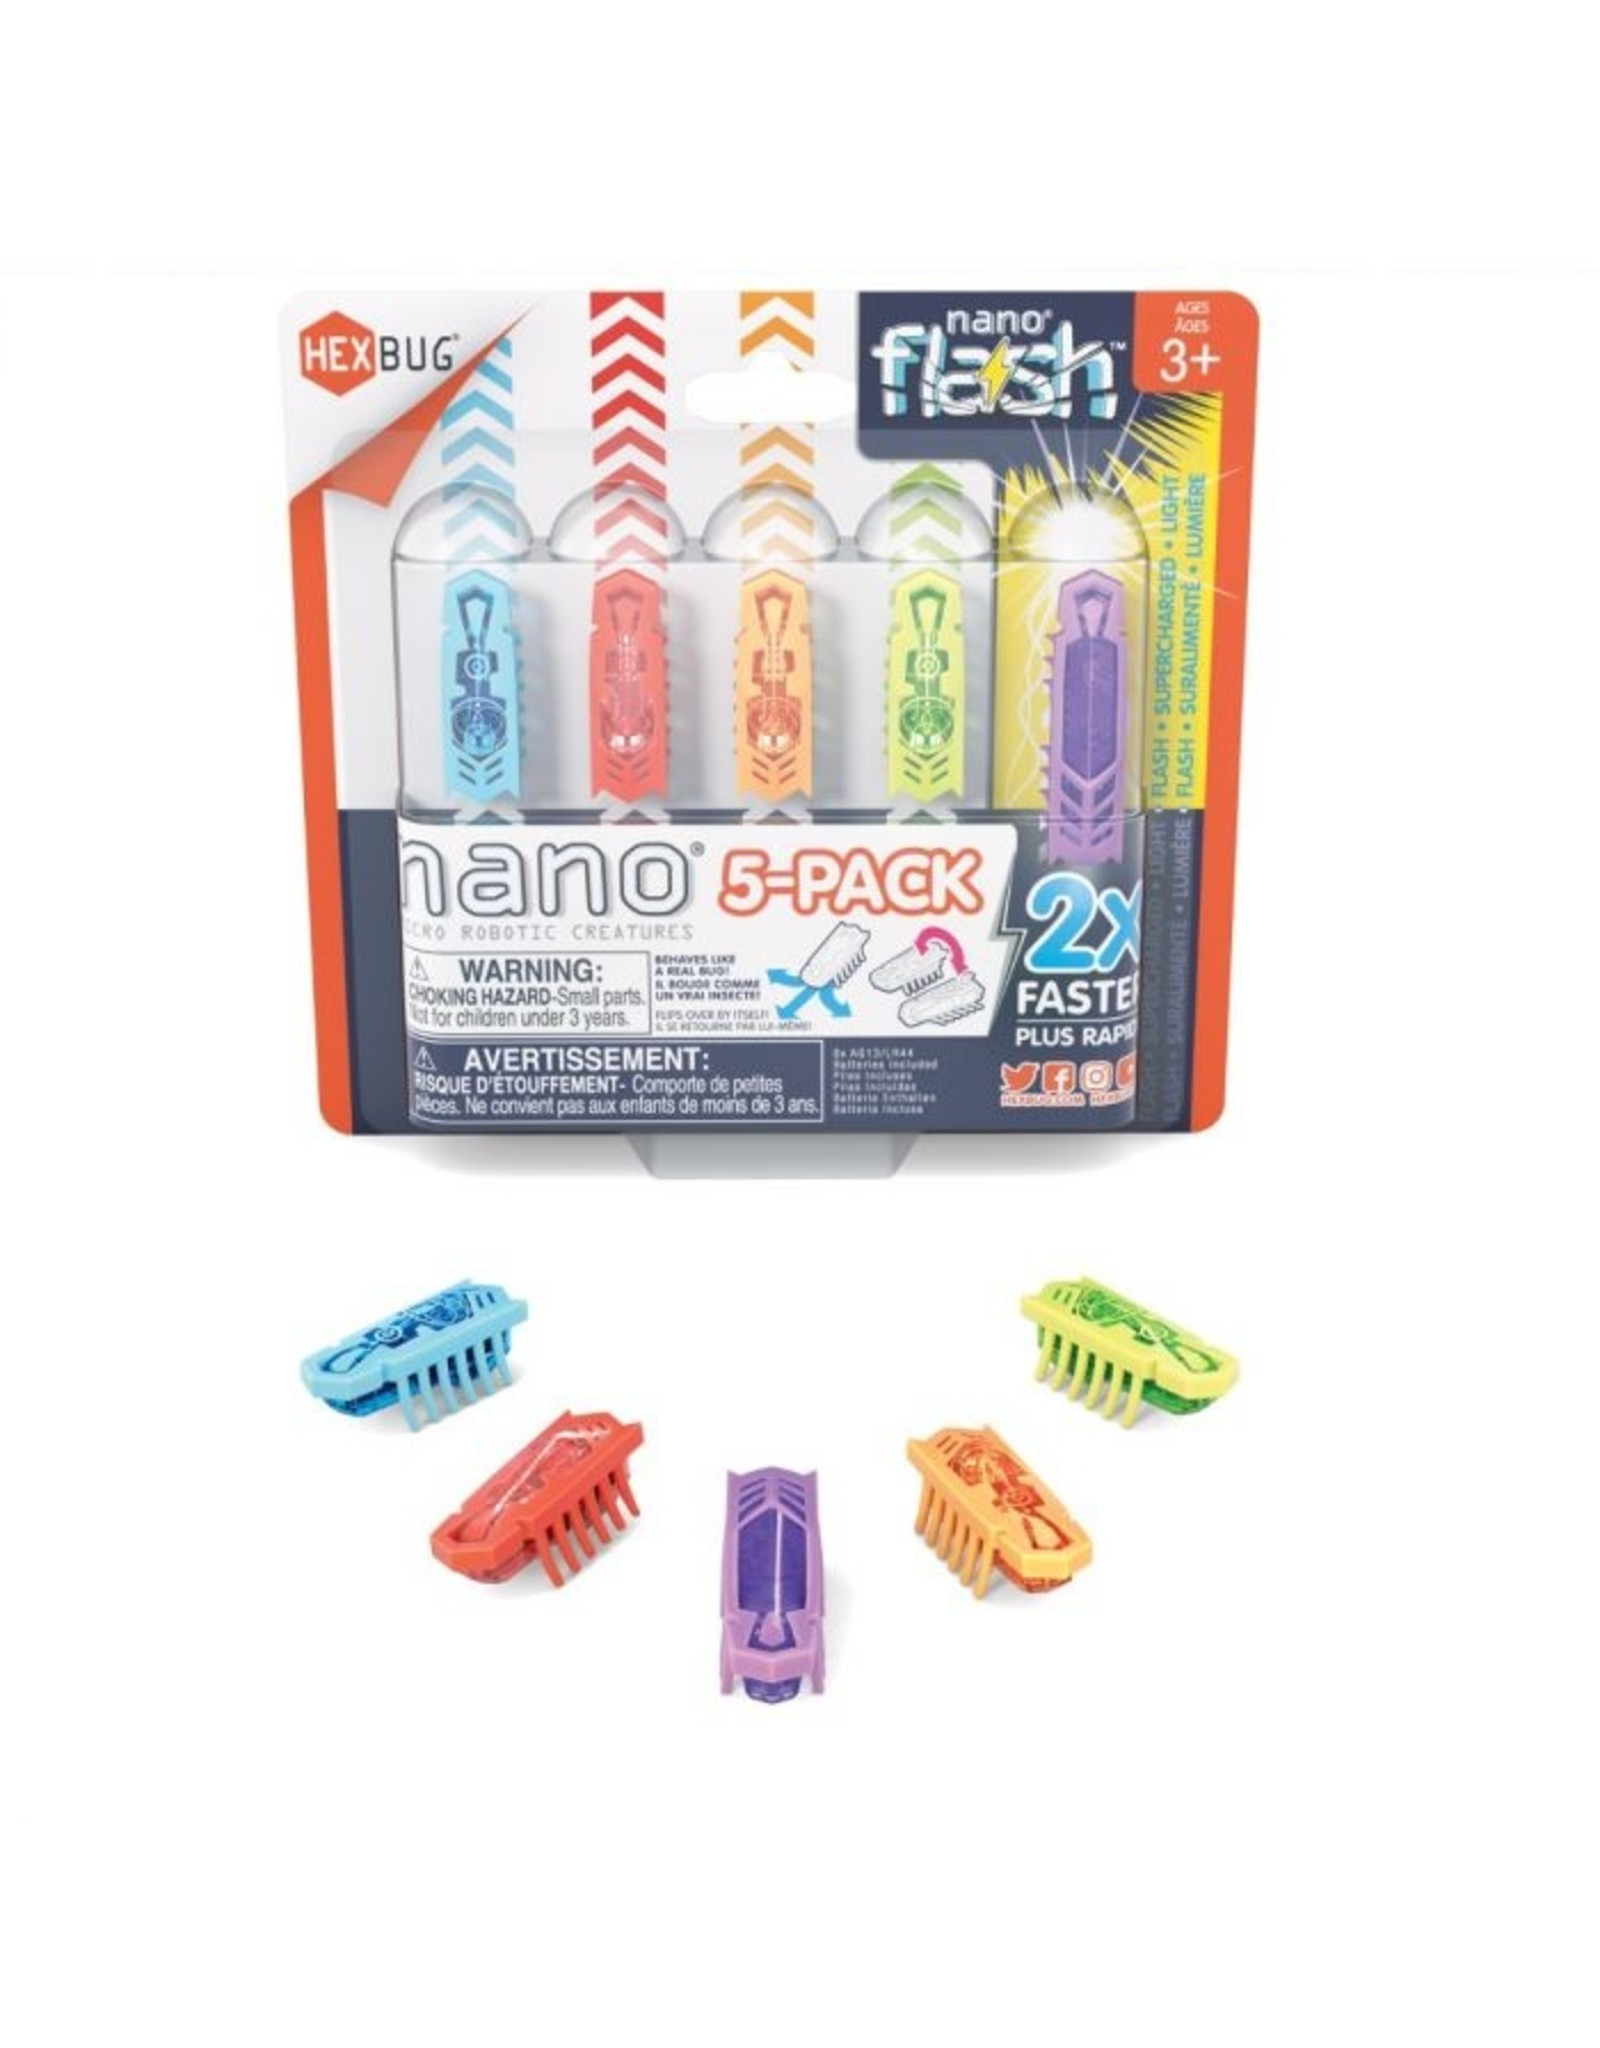 Innovation First HEXBUG Flash Nano 5 pack